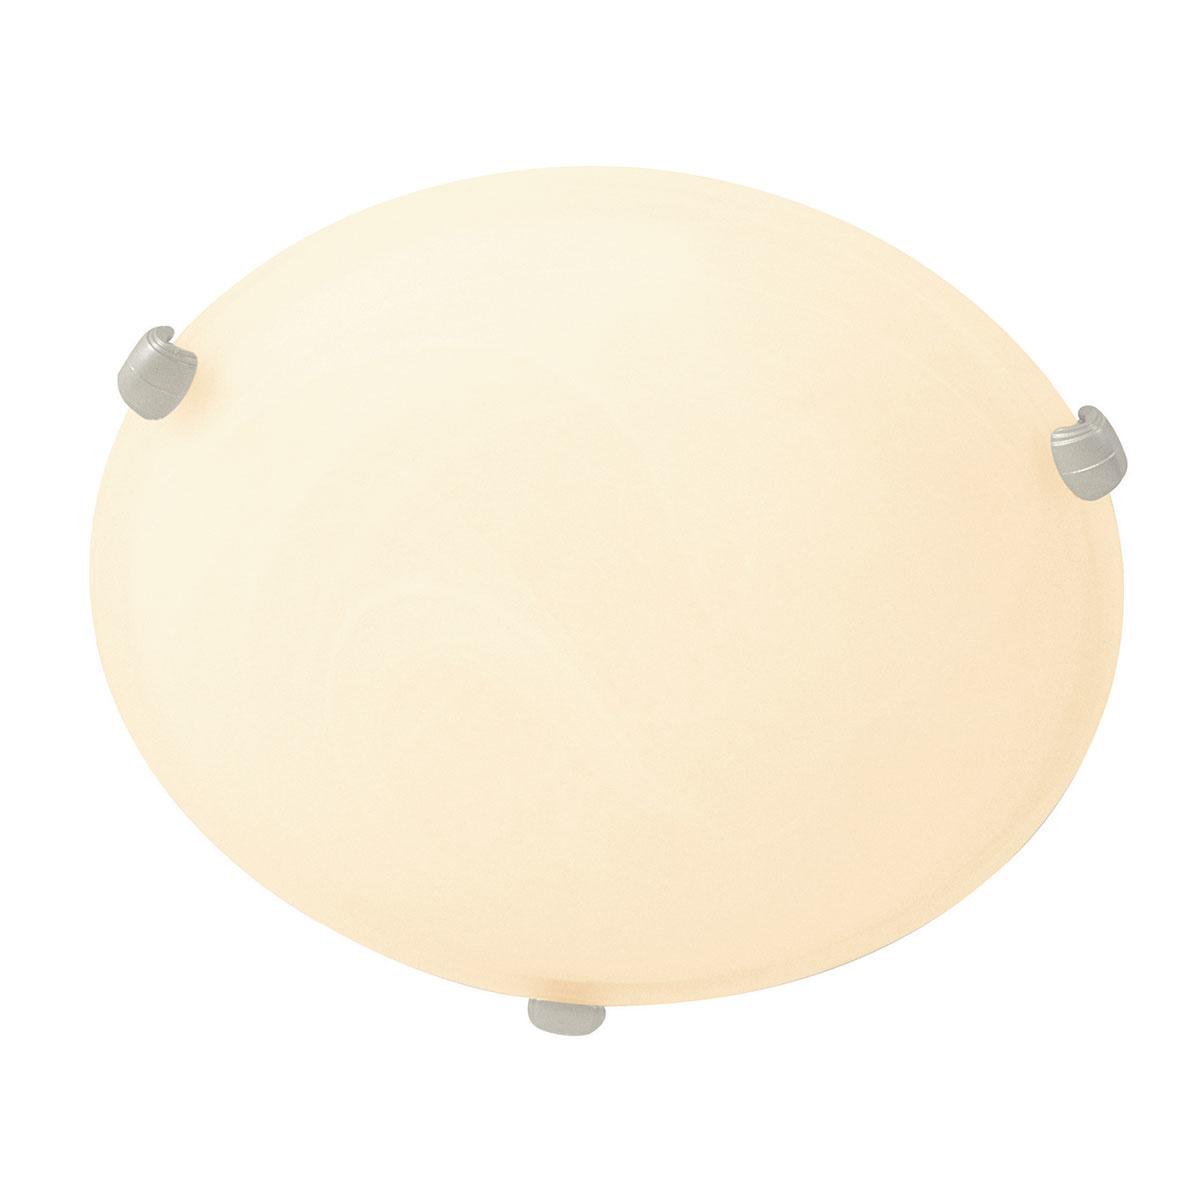 Steinhauer Plafondlamp 2361 staal